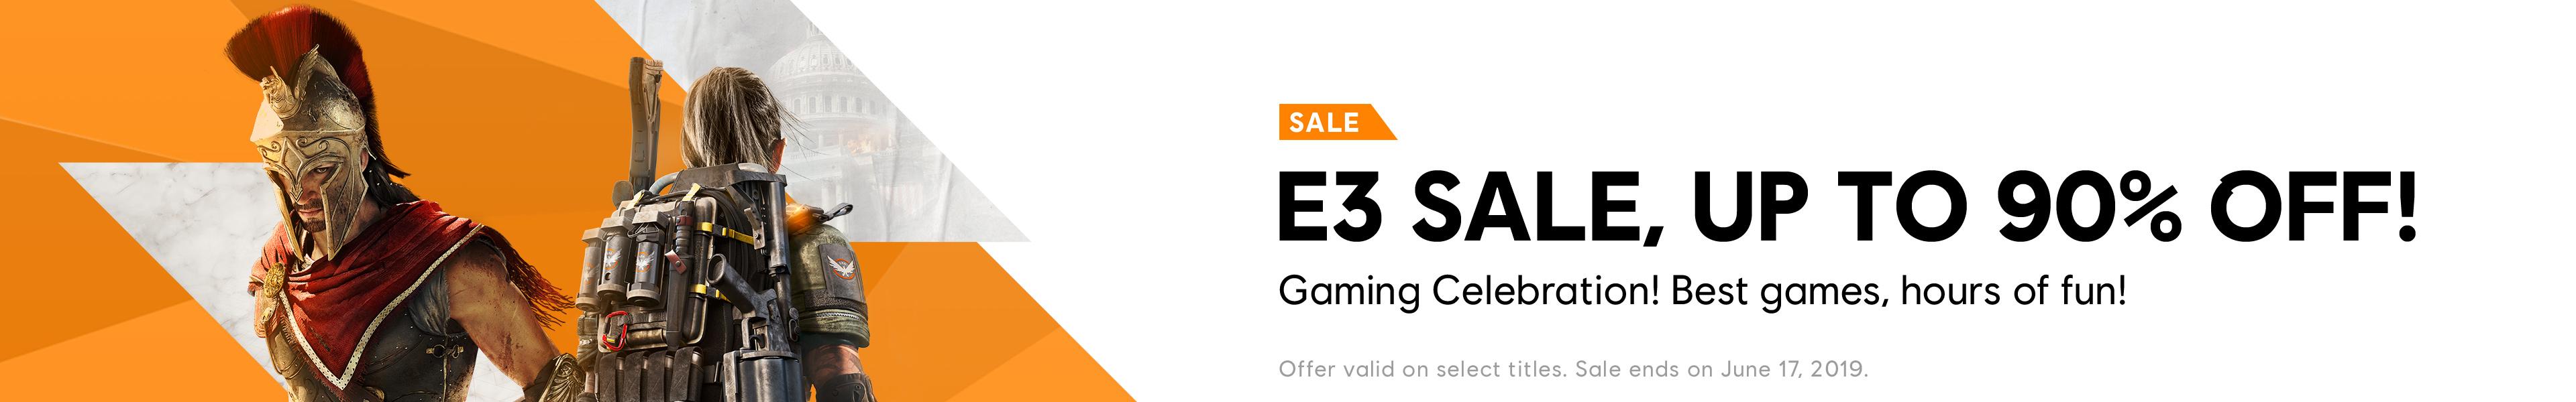 E3 Sale Category banner